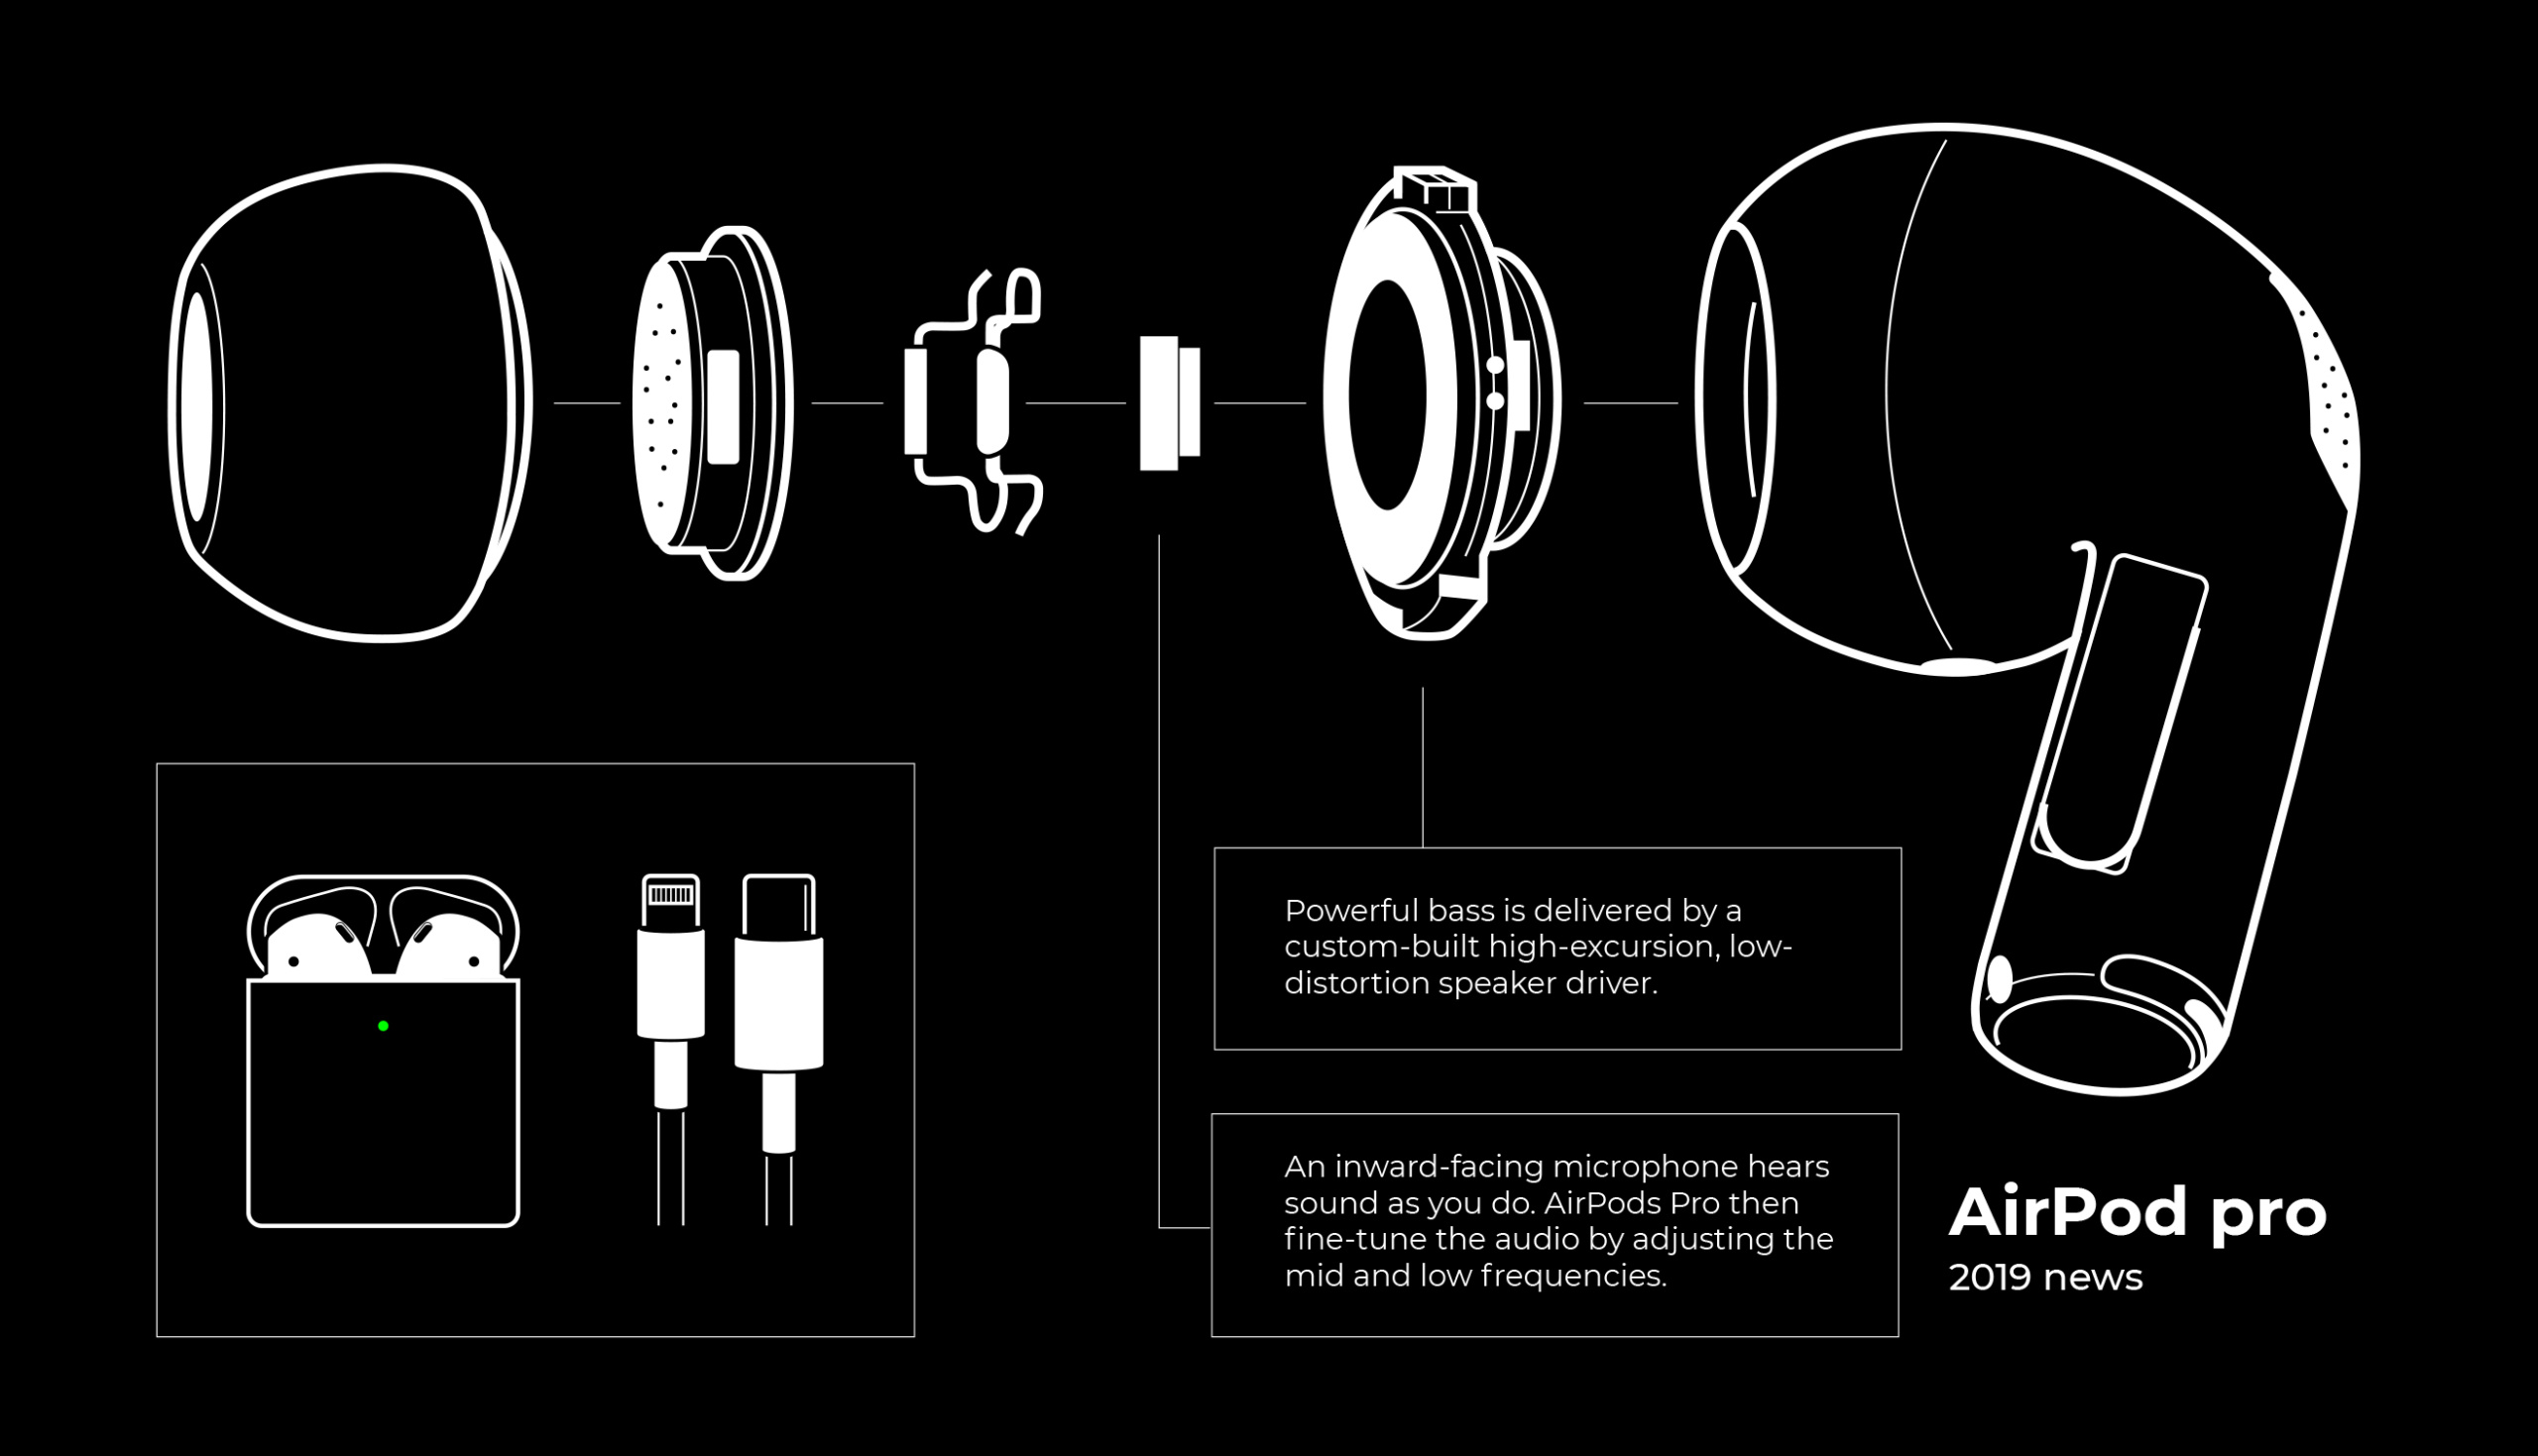 Air Pod tech drawing